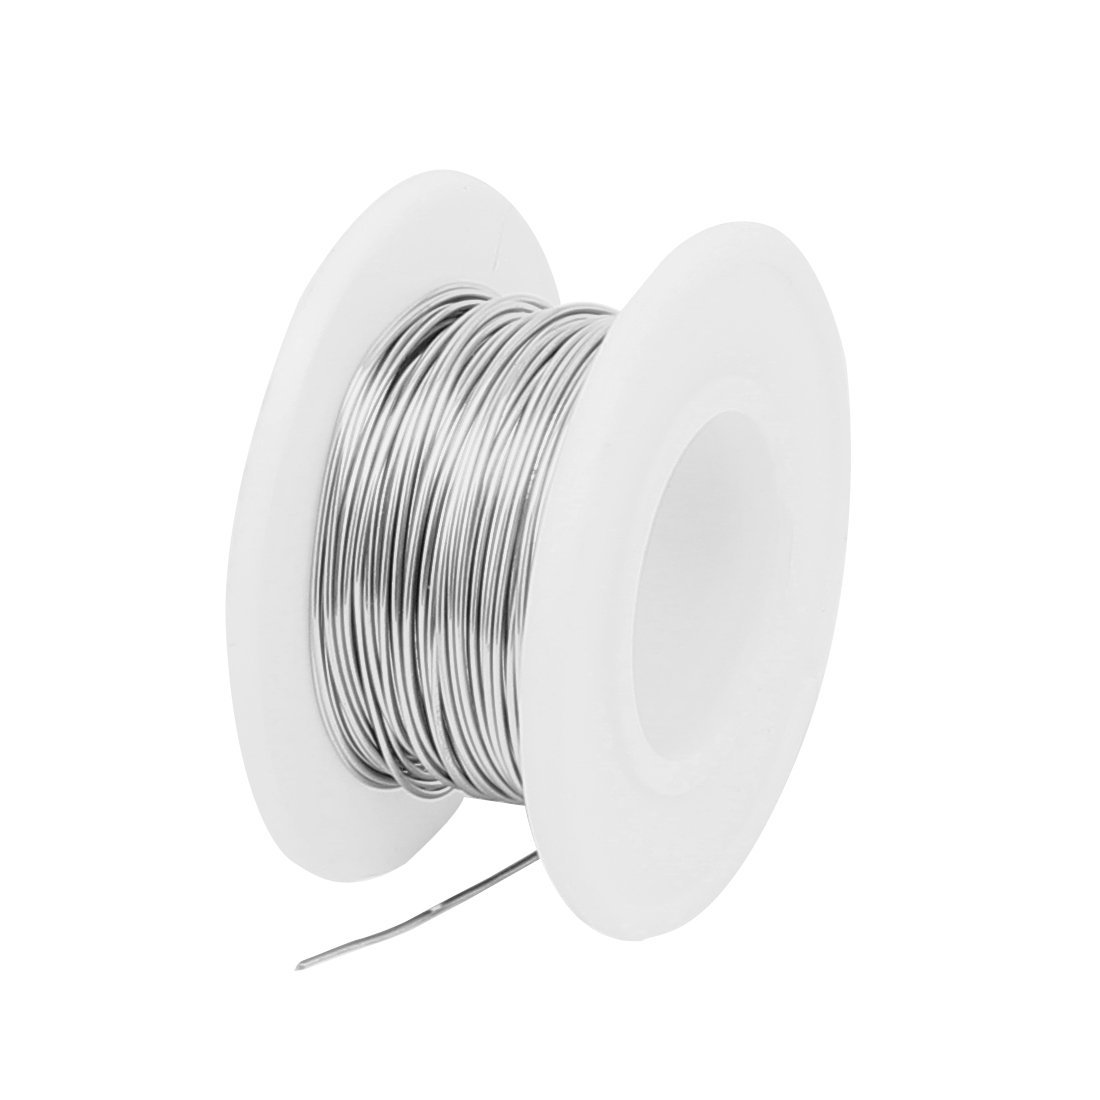 eDealMax 10M 0.55mm 23AWG Cable Constantan calentador de alambre para Elementos de calentamiento - - Amazon.com